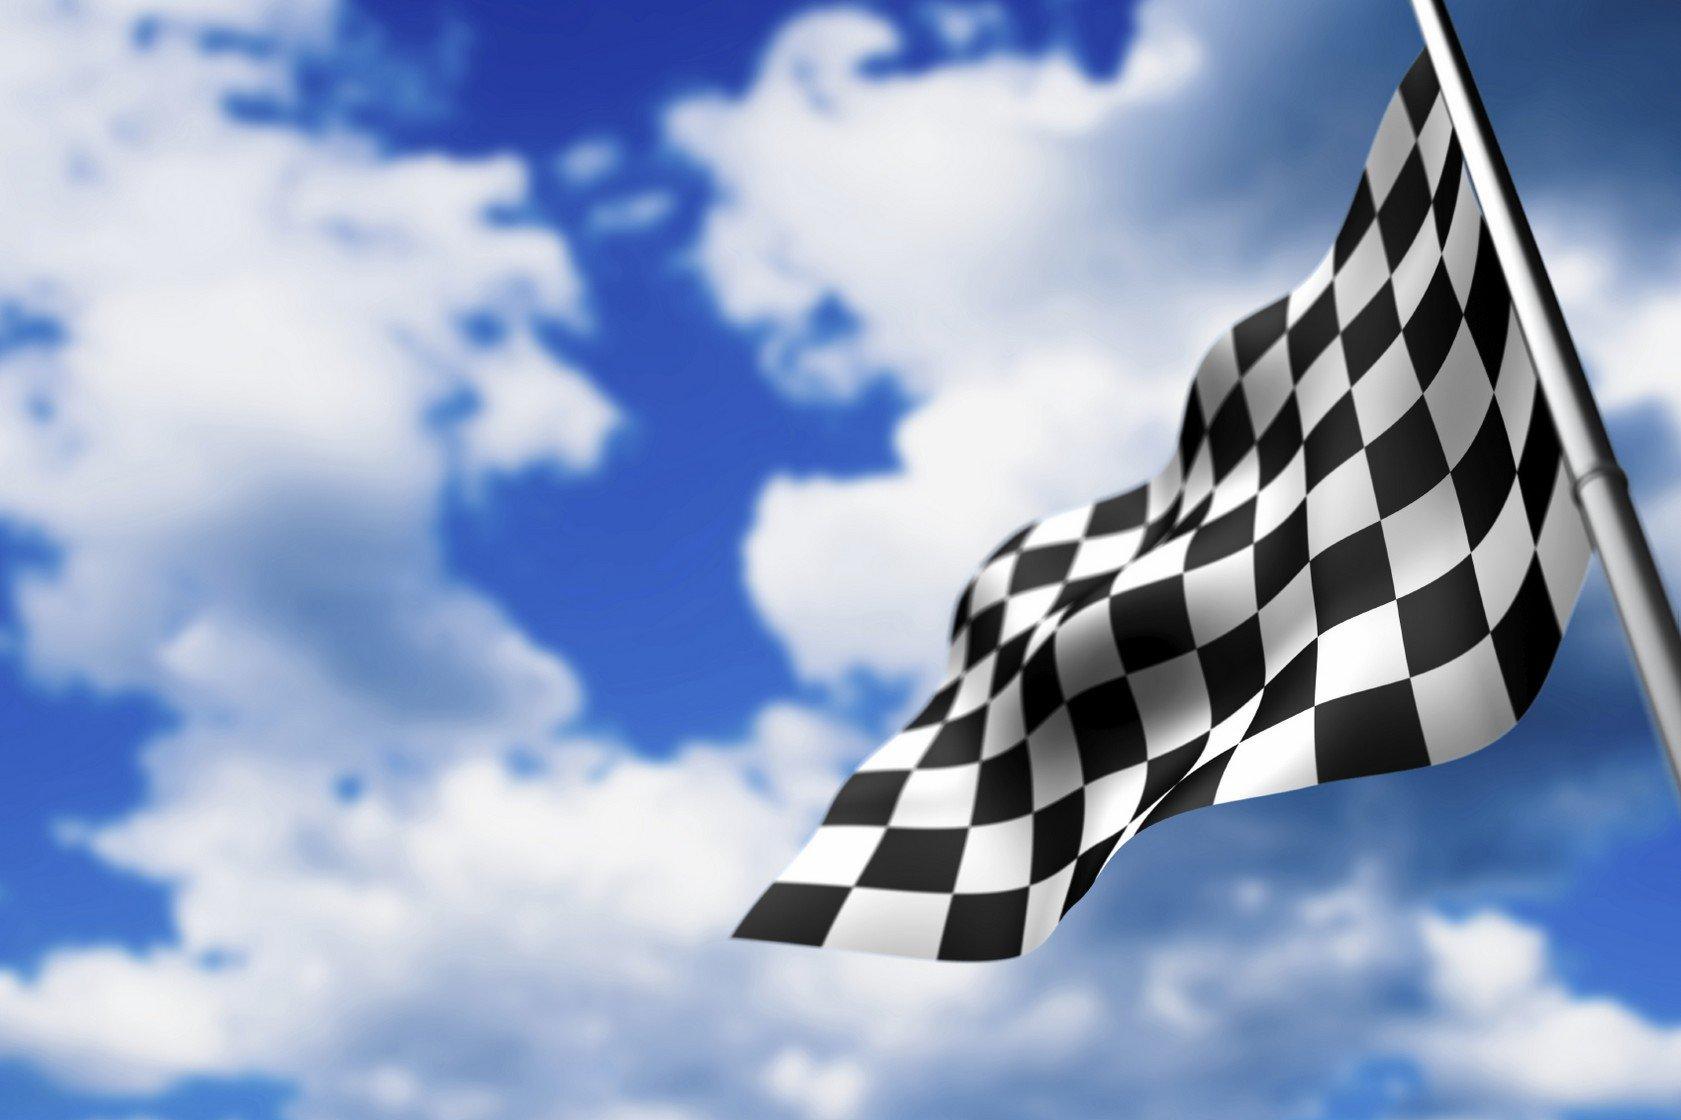 47+ Checkered Flag Wallpaper on WallpaperSafari